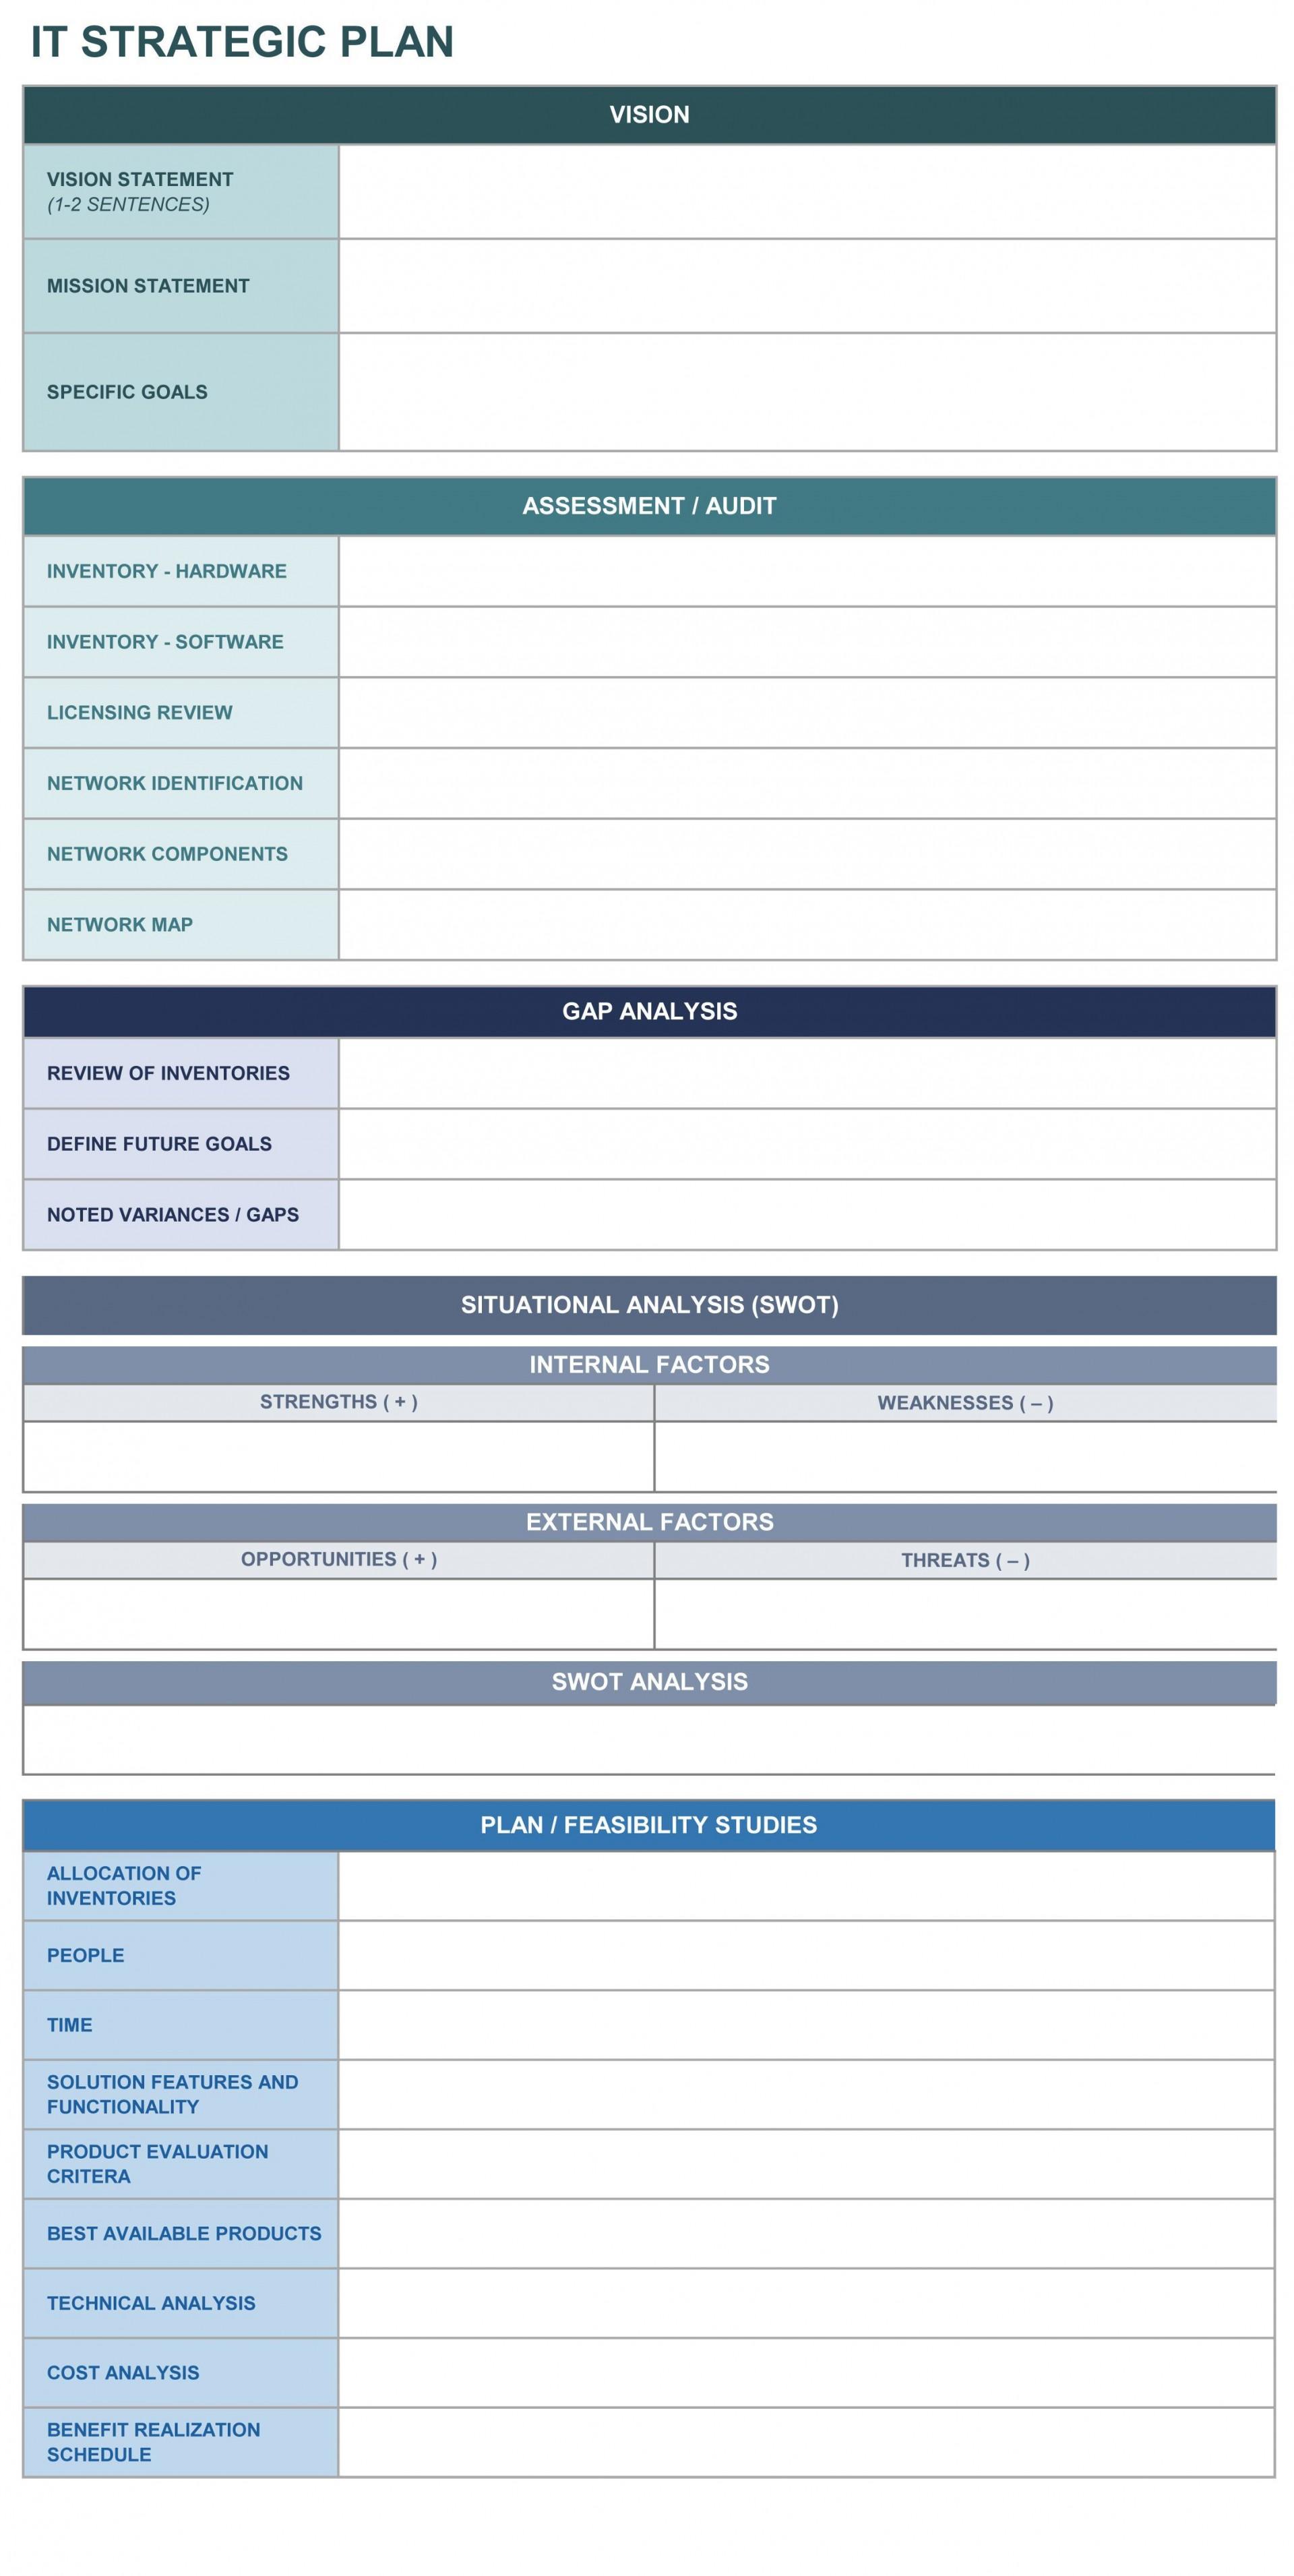 004 Dreaded Strategic Planning Template Excel Free Idea 1920